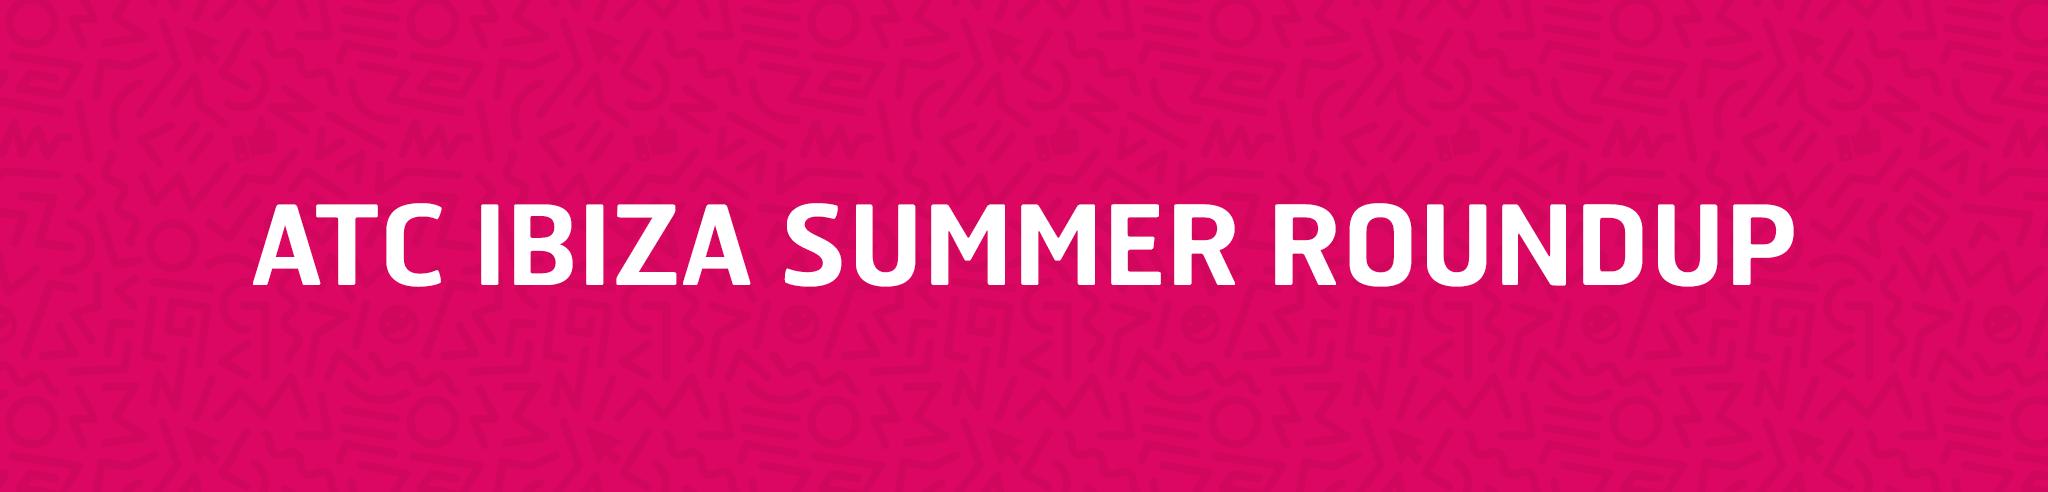 ATC Ibiza Summer Roundup